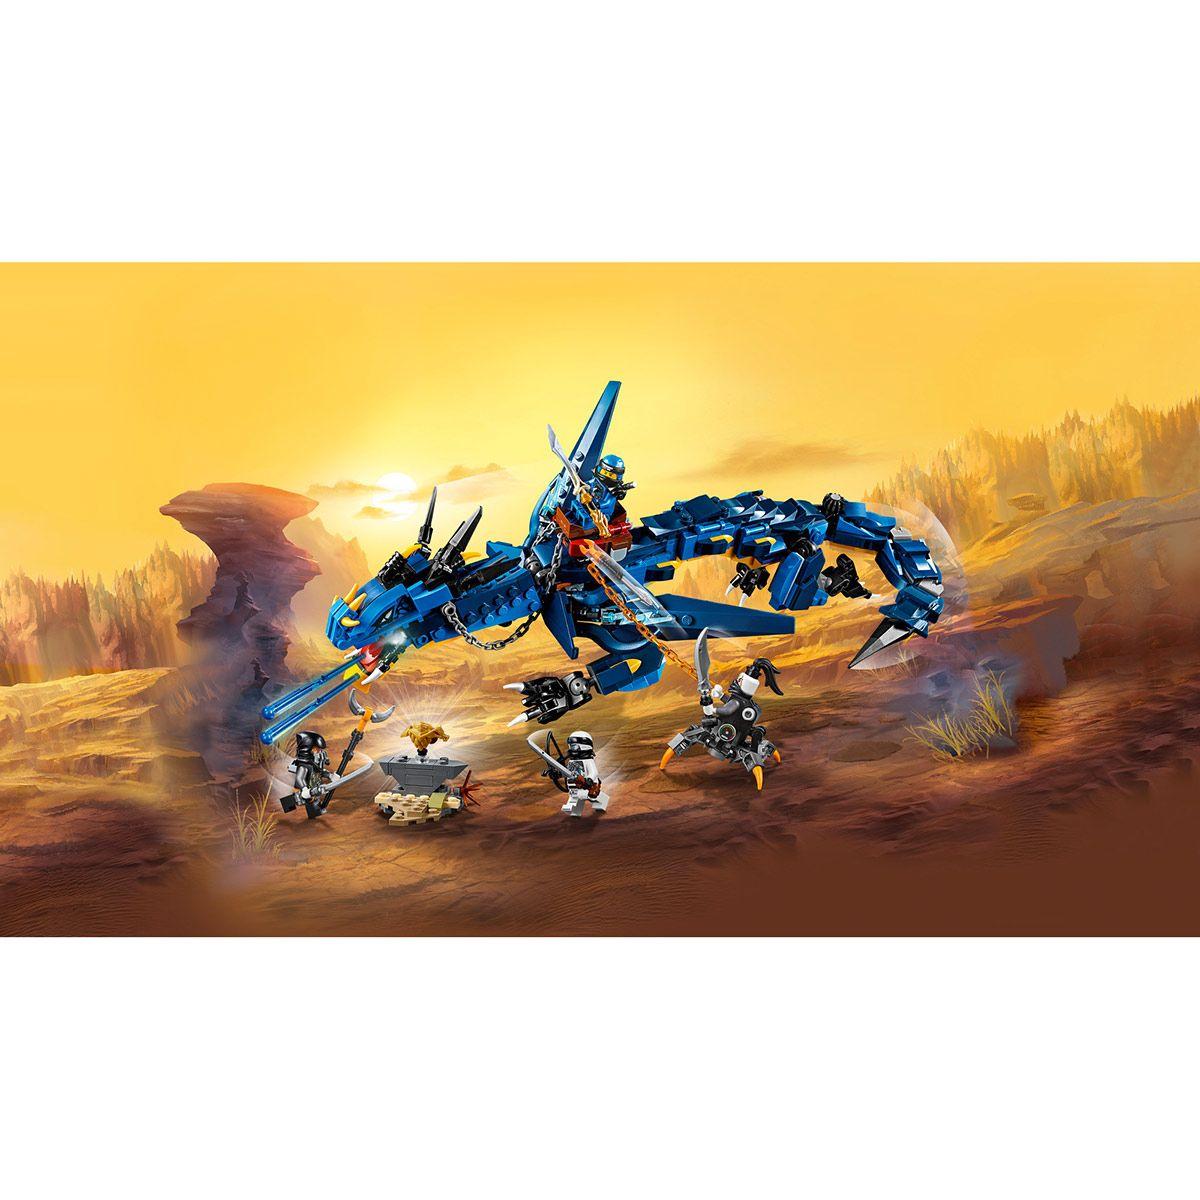 Lego Et Le Dragon PiratesChevaliers Stormbringer Ninjago 70652 F3T1JKcl